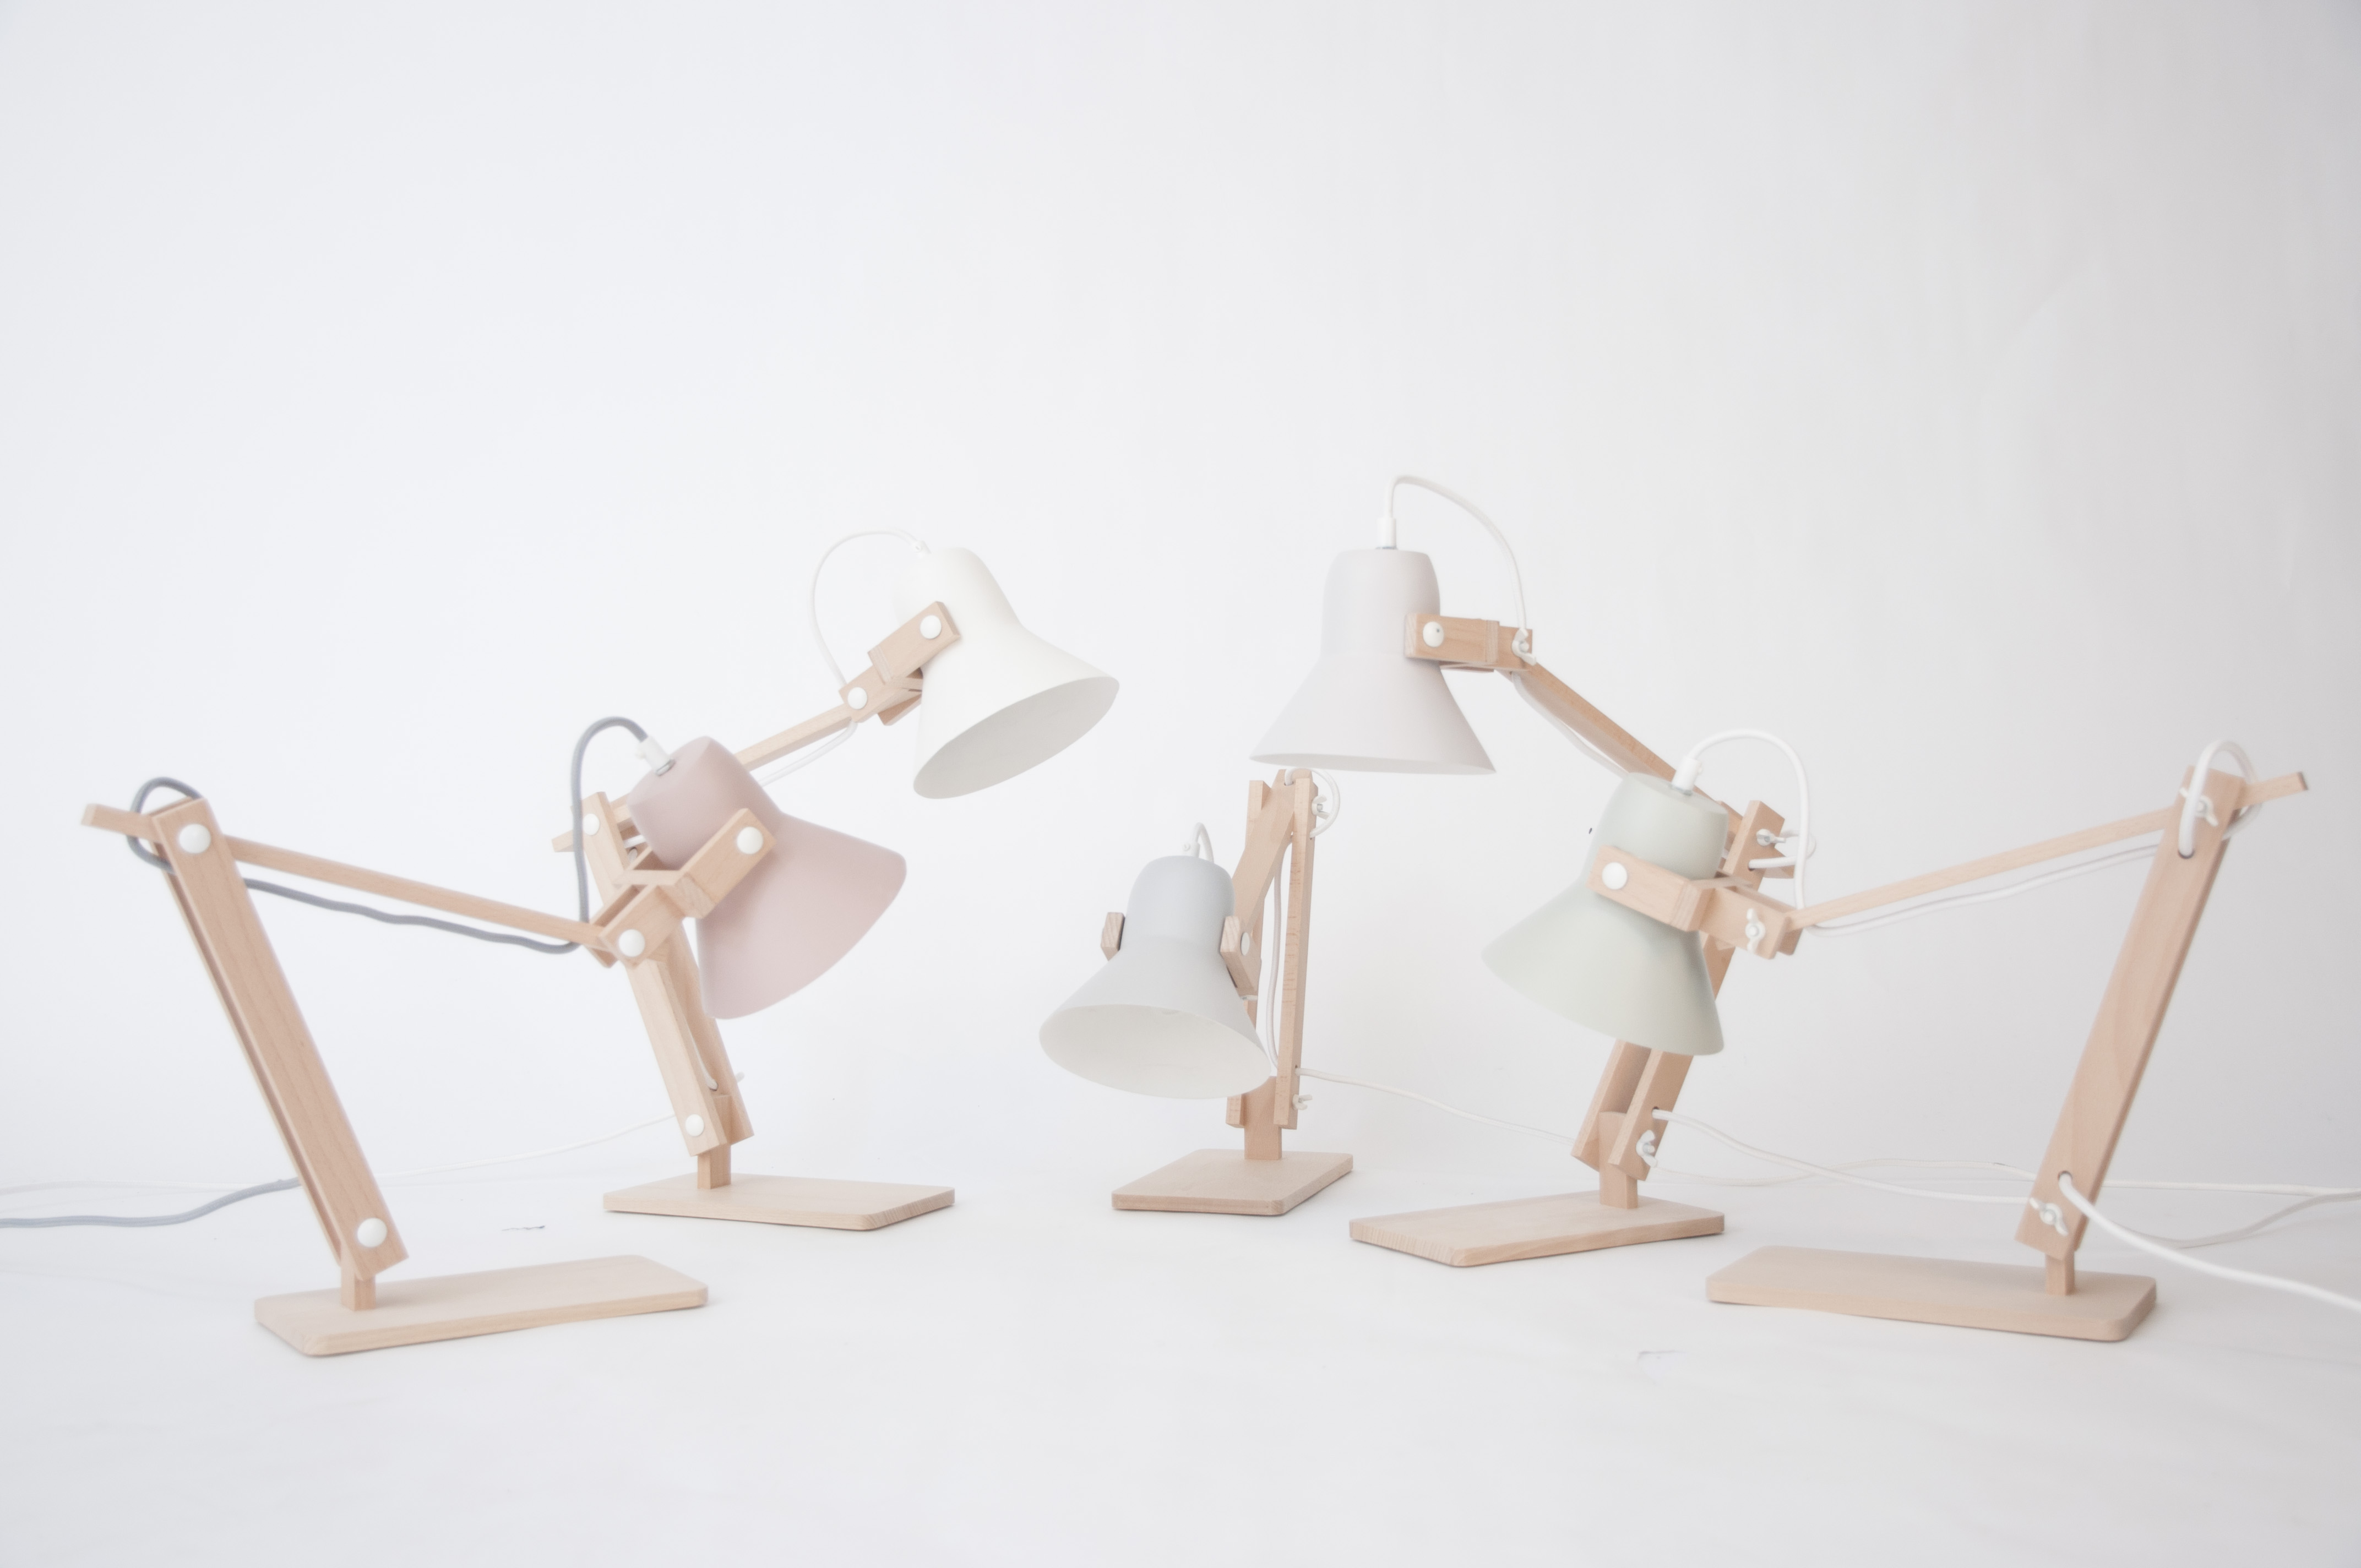 Roze Slaapkamer Lamp : M oss design pixoss tafellamp roze kopen bestel online bij gimmii